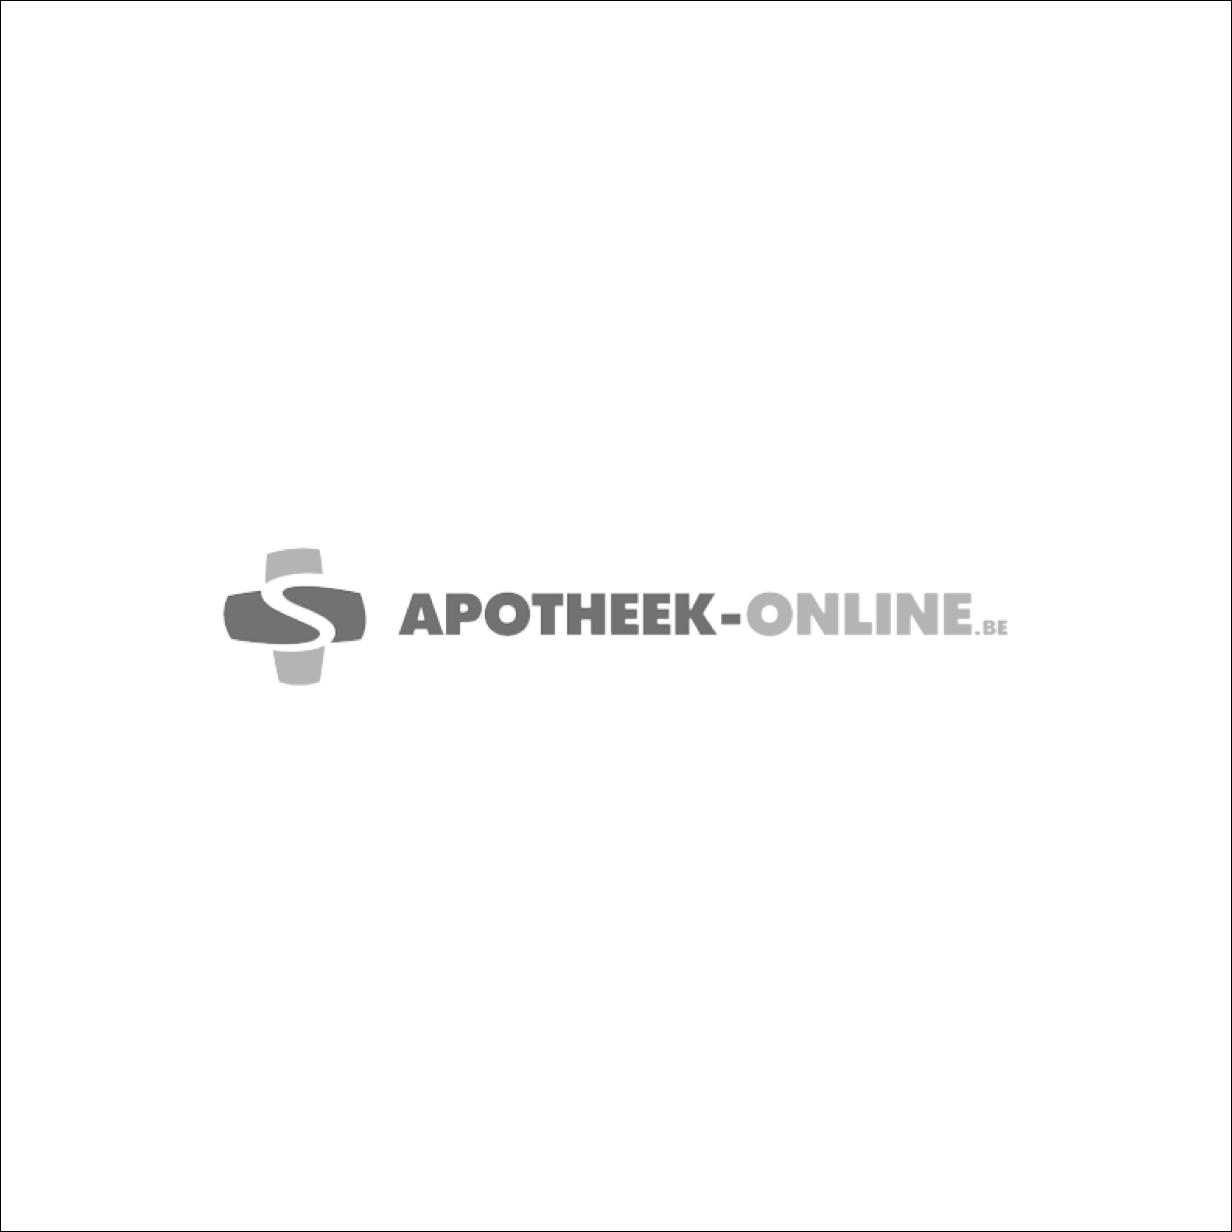 GAZIN KP N/STER 12P 10,0X10,0CM 100 18507